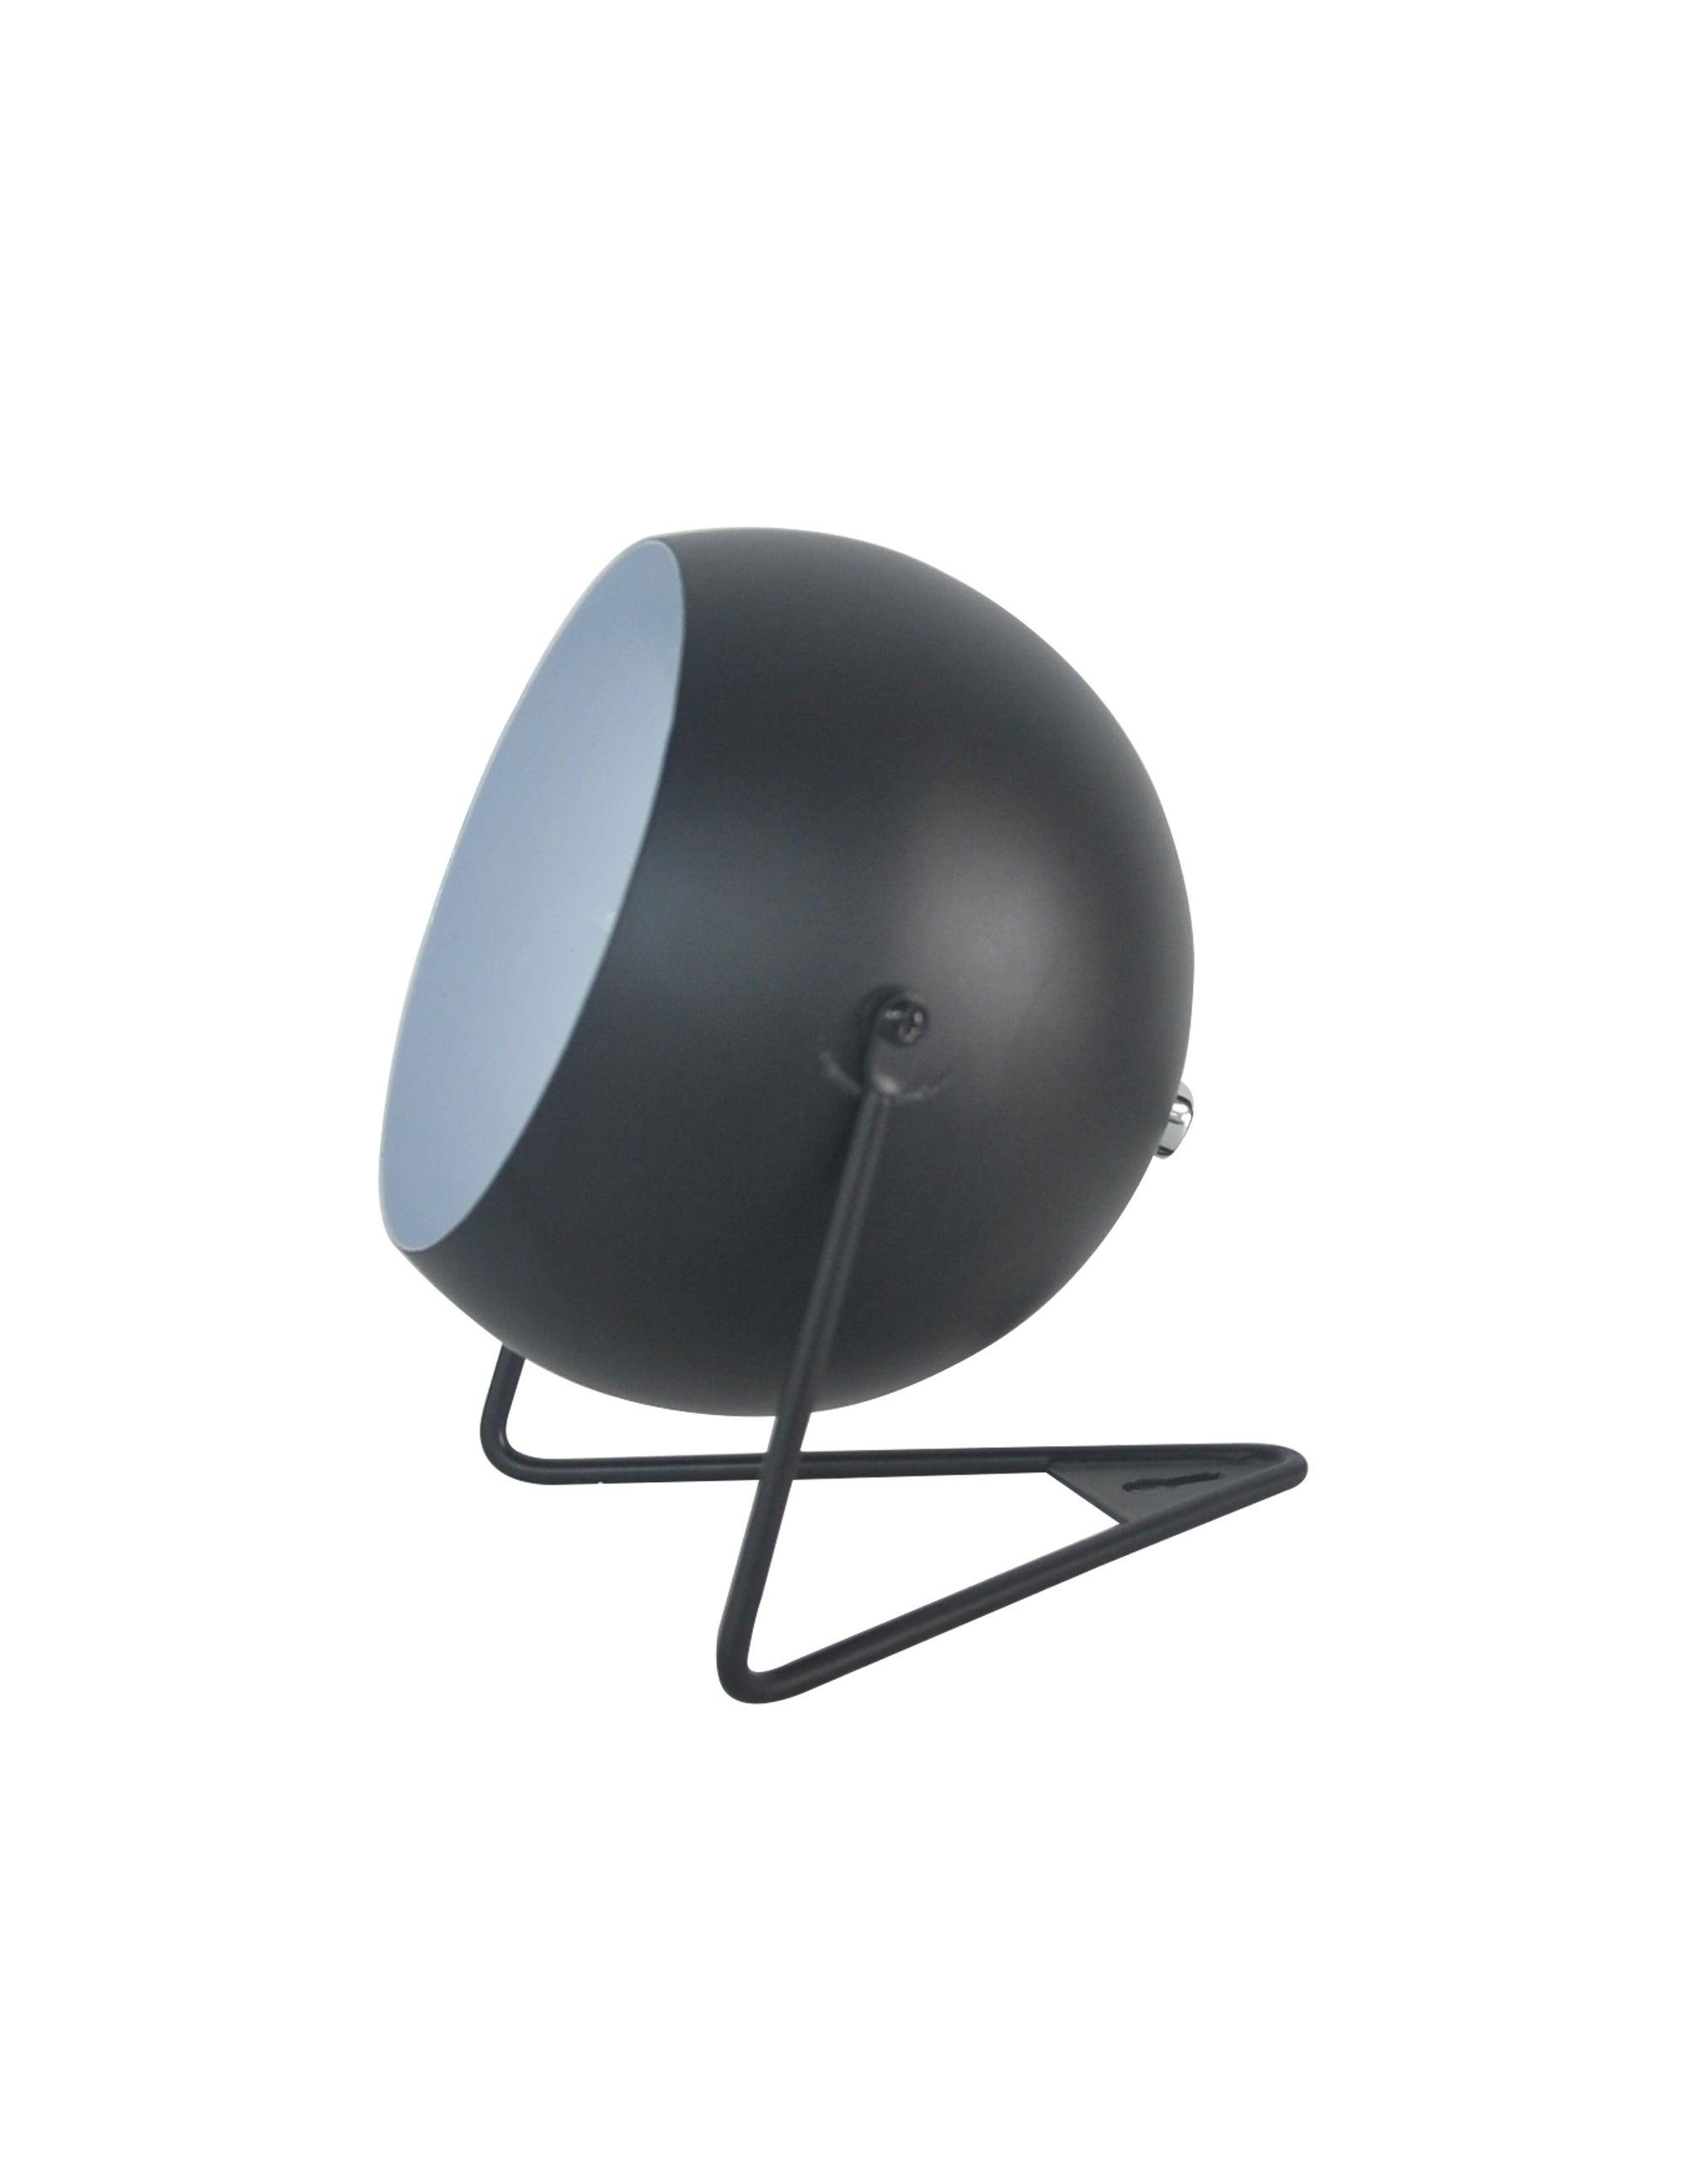 Lampe design métal noir, INSPIRE Bari